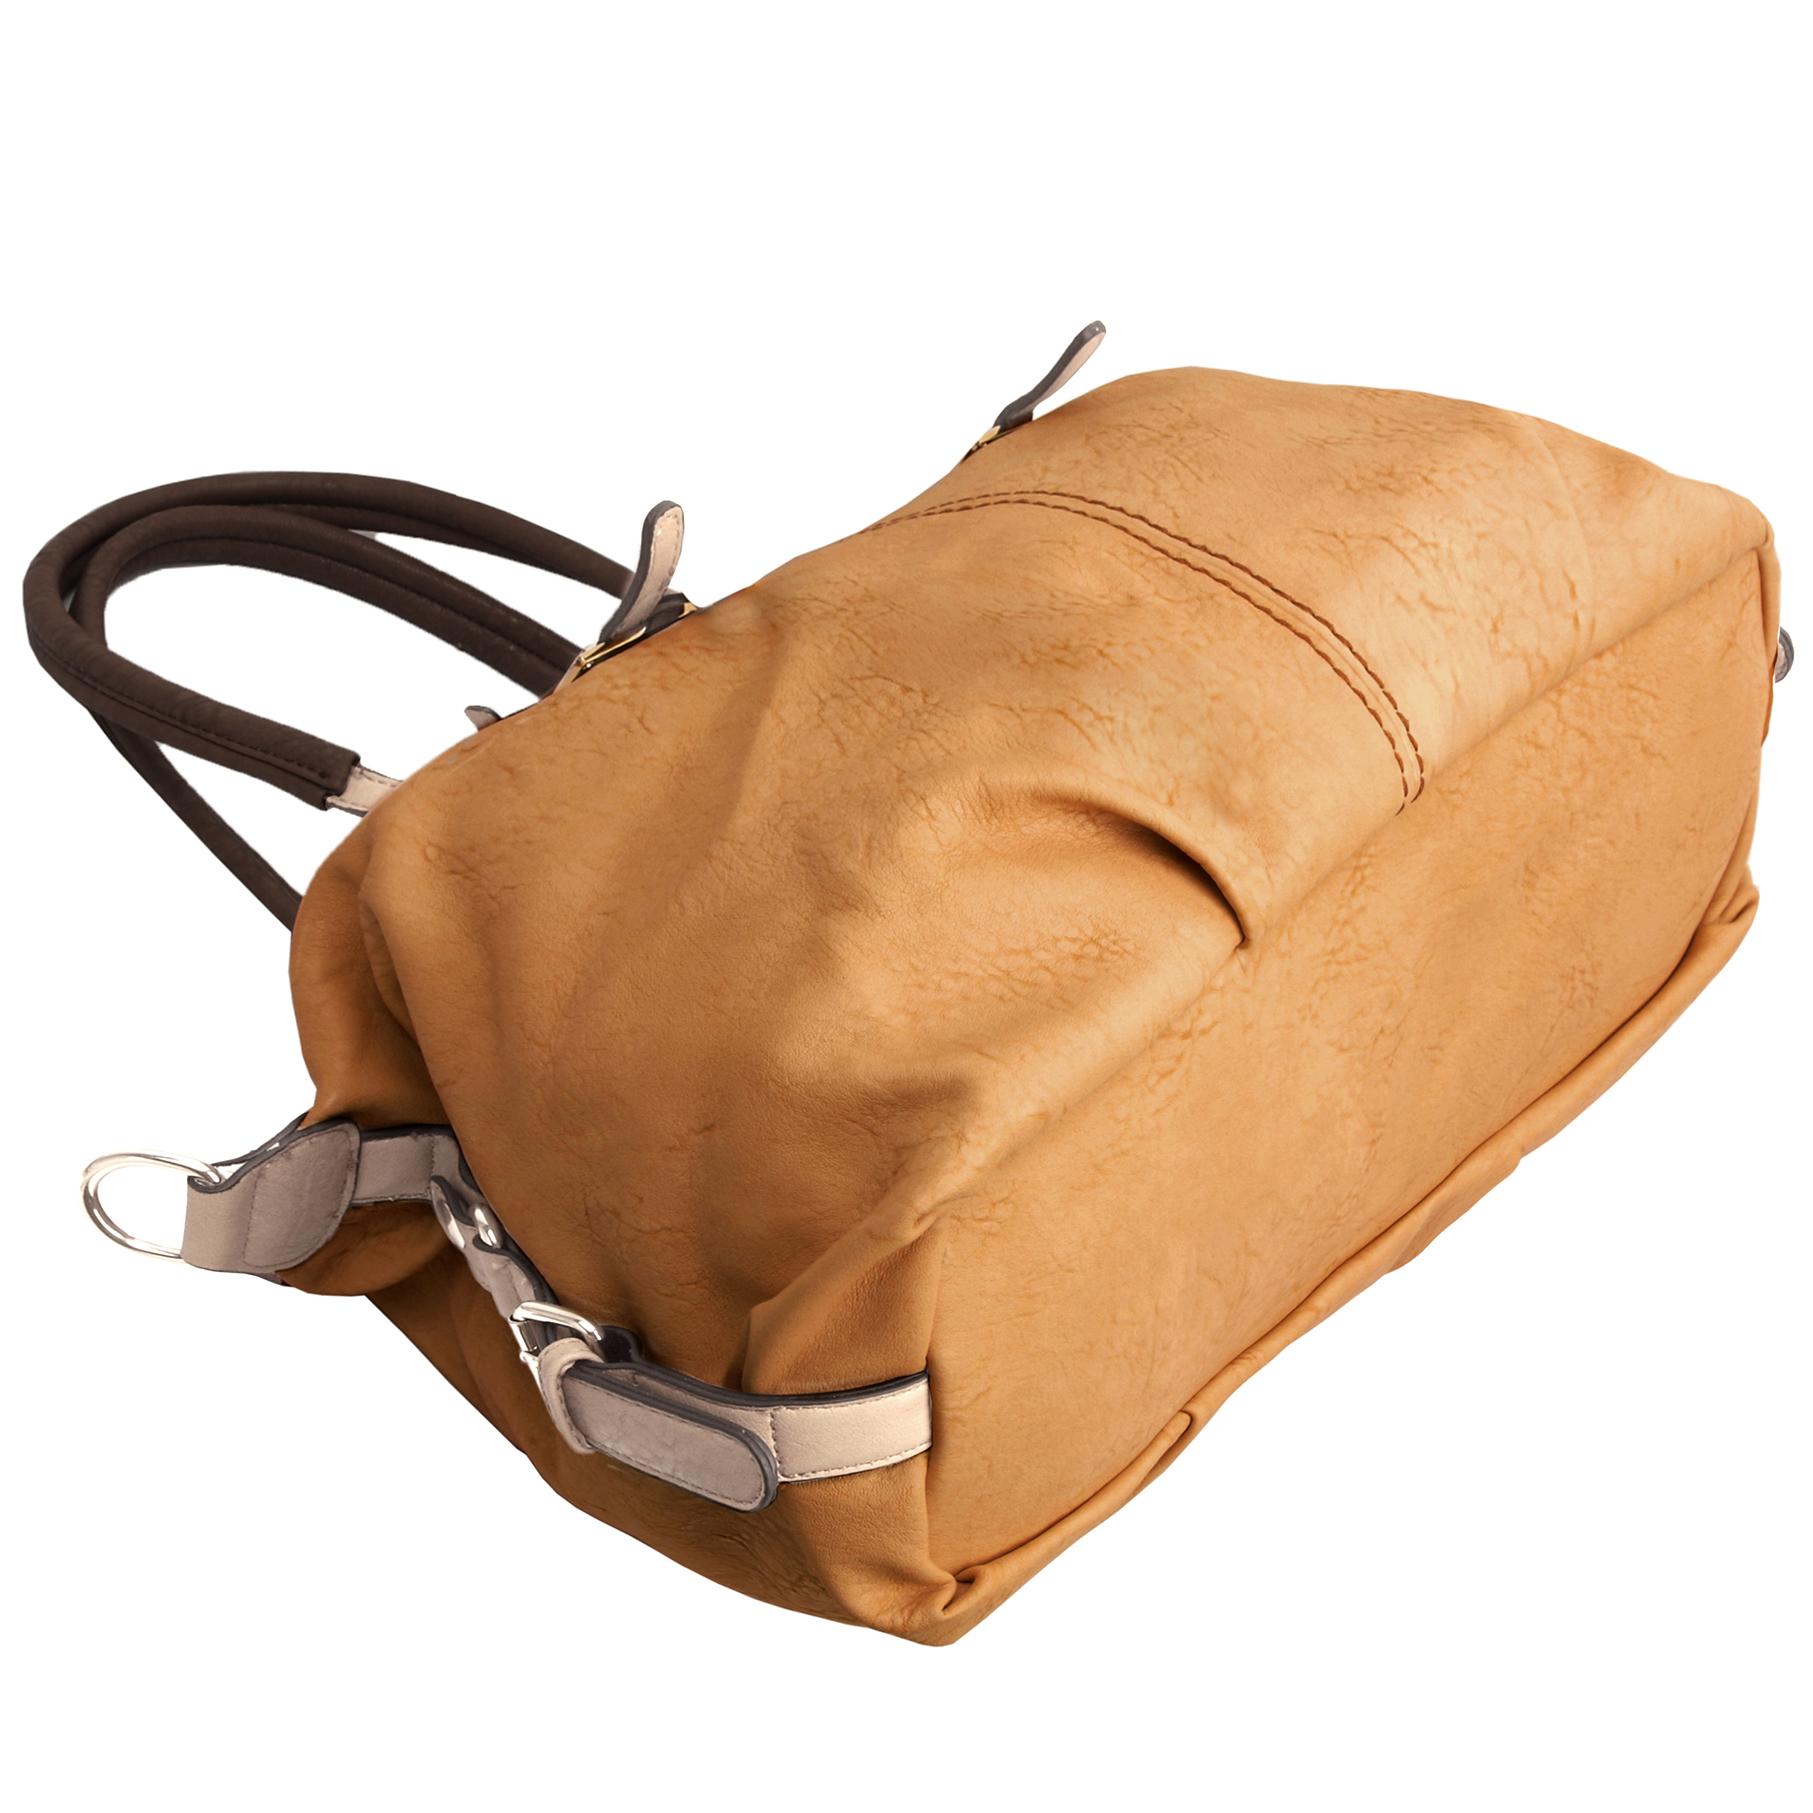 ACACIA Caramel Large Everyday Shopper Hobo Handbag Bottom